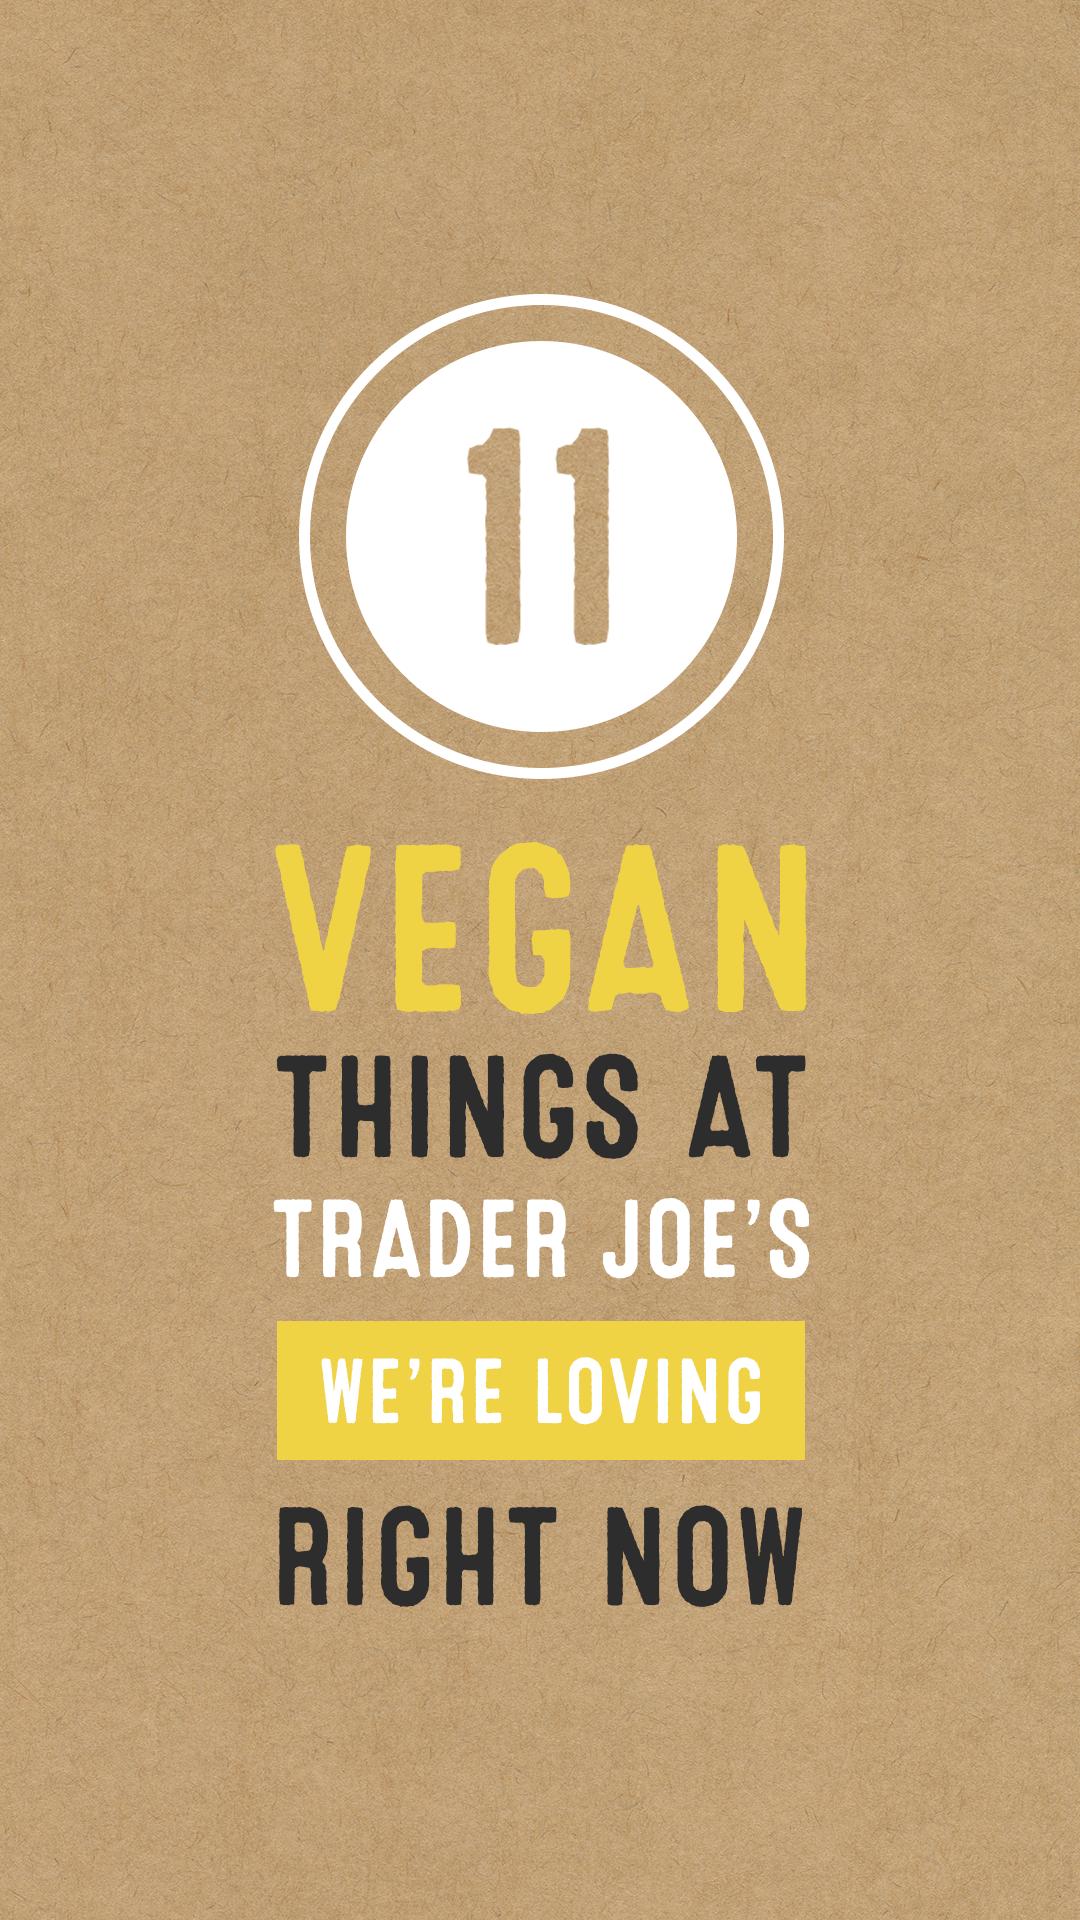 11 Vegan Things at Trader Joe's We're Loving Right Now